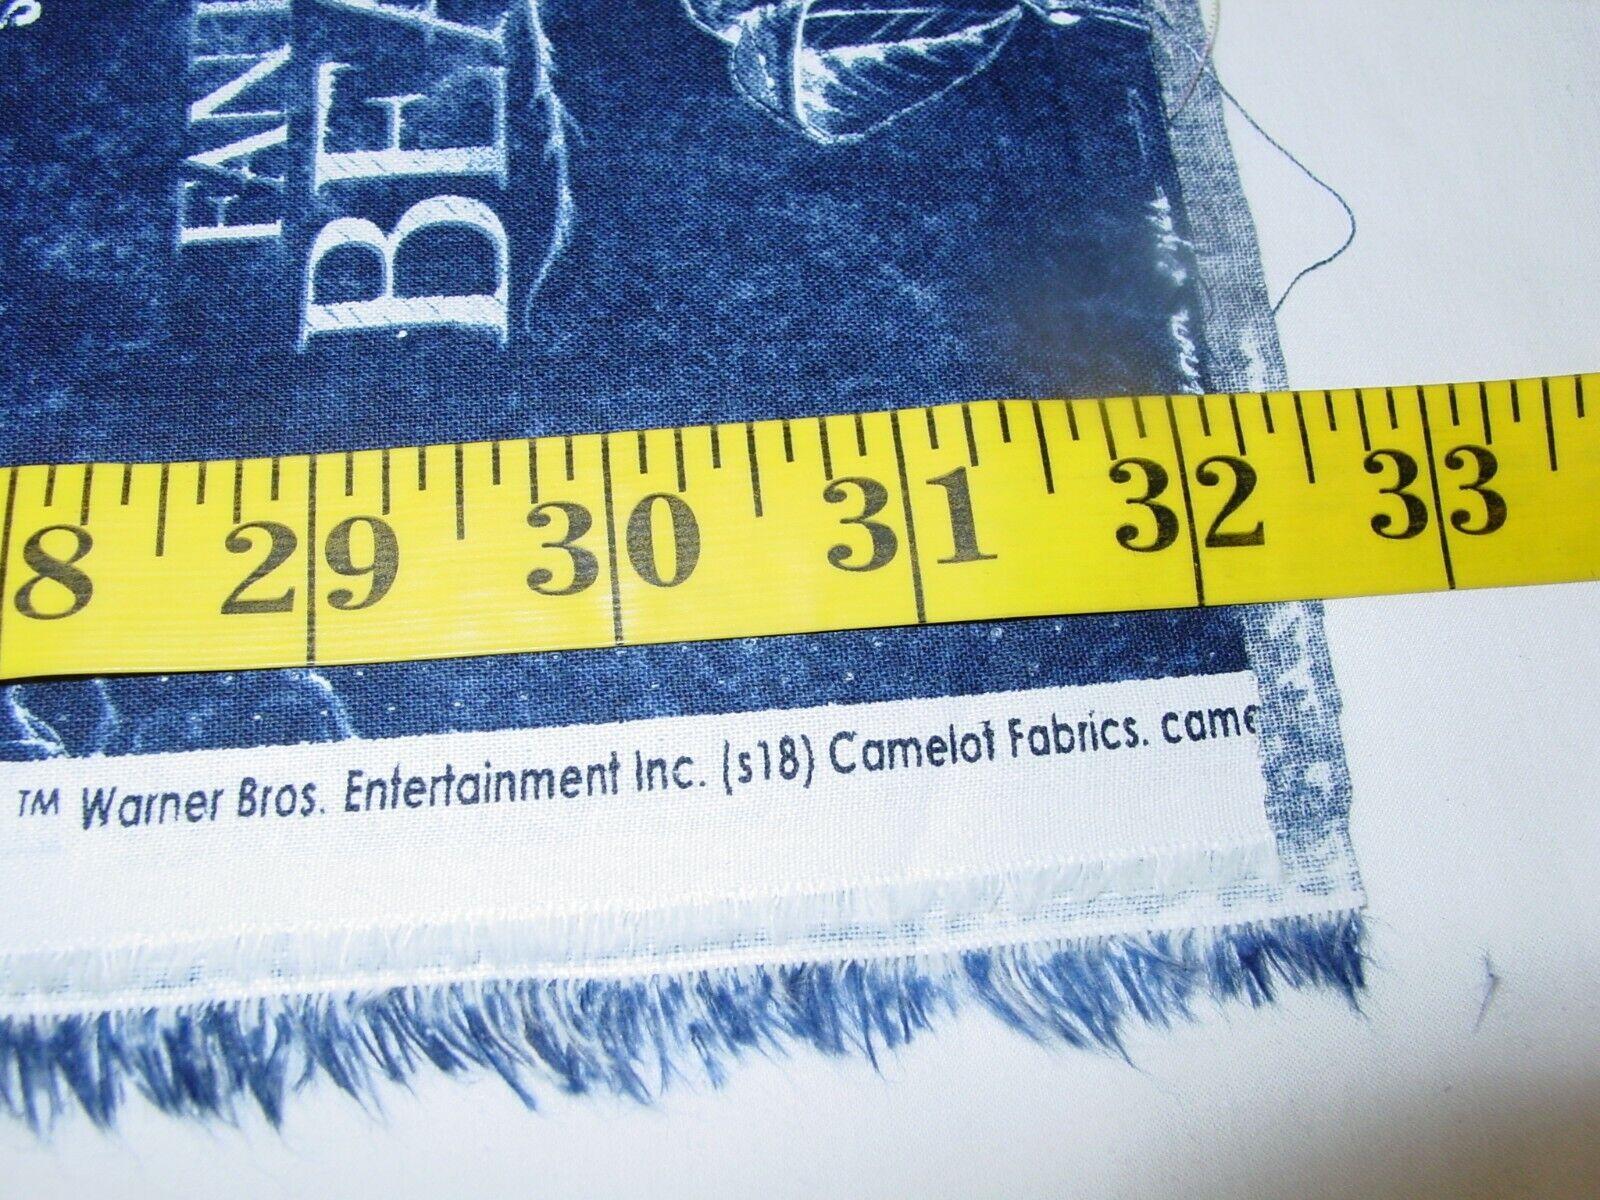 FANTASTIC BEAST BLUE 100 COTTON FABRIC REMNANT LENGTH 31 X WIDTH 43  - $10.50